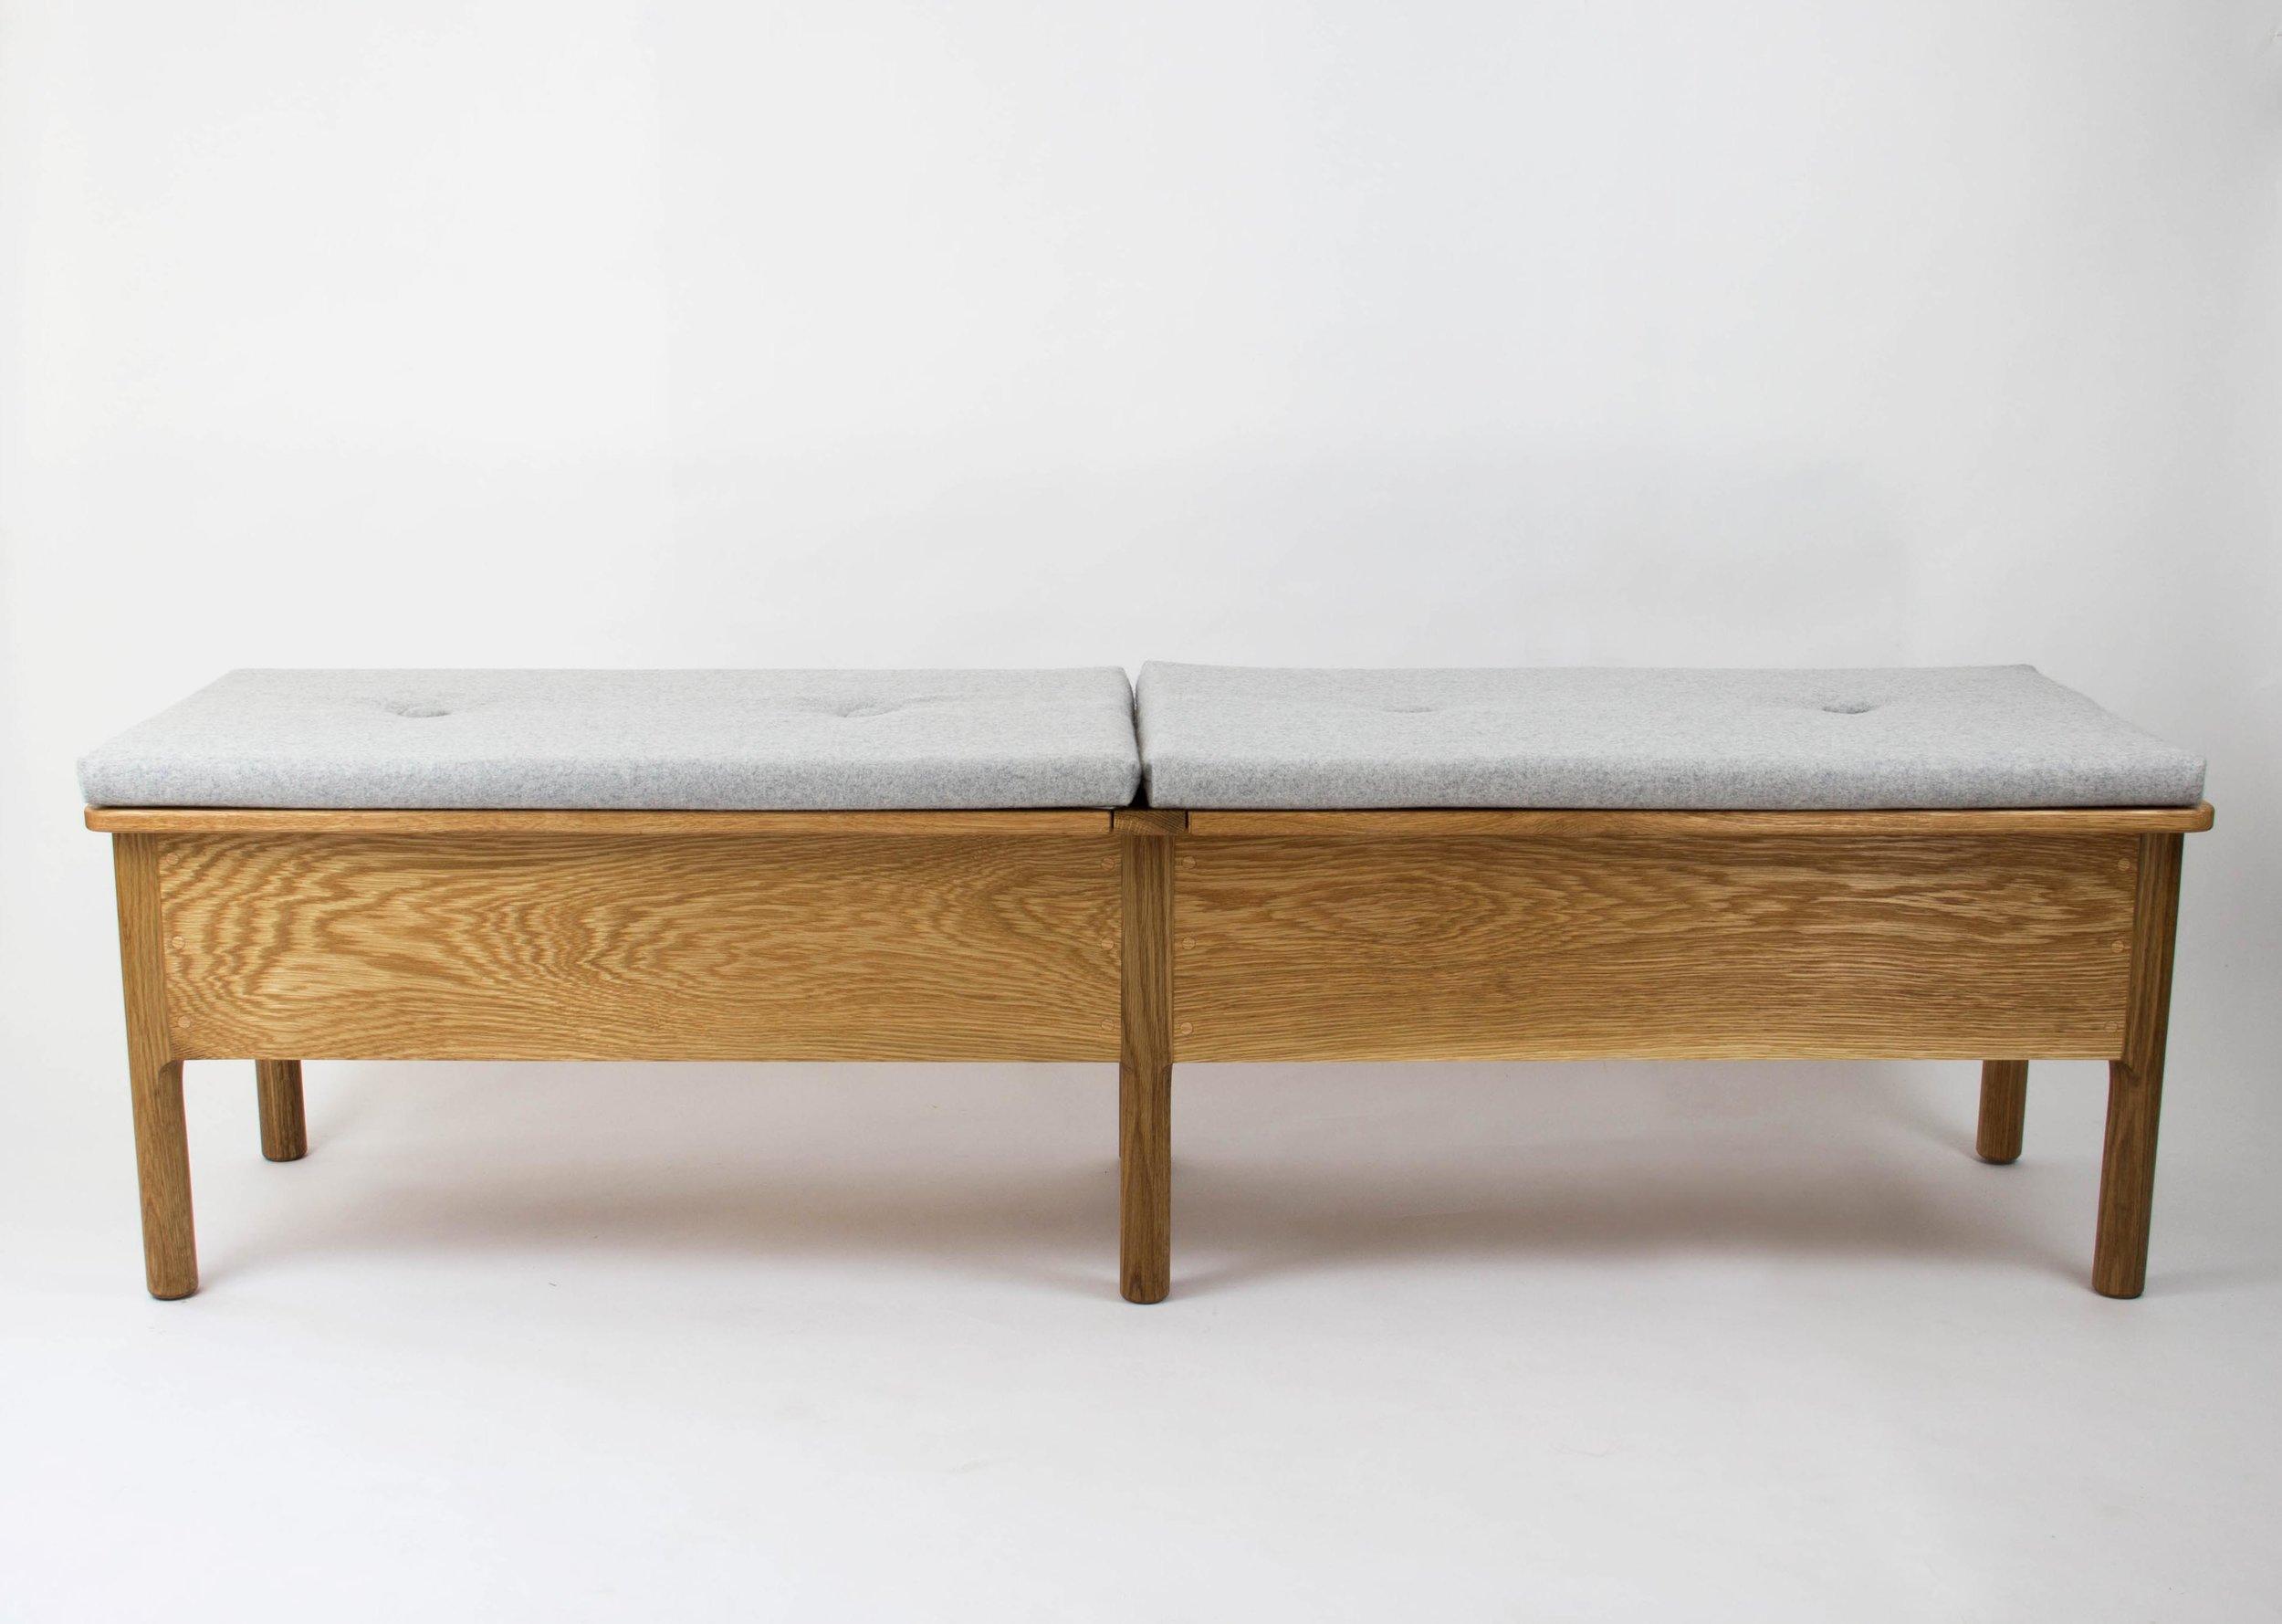 Bench-2-Small.jpg